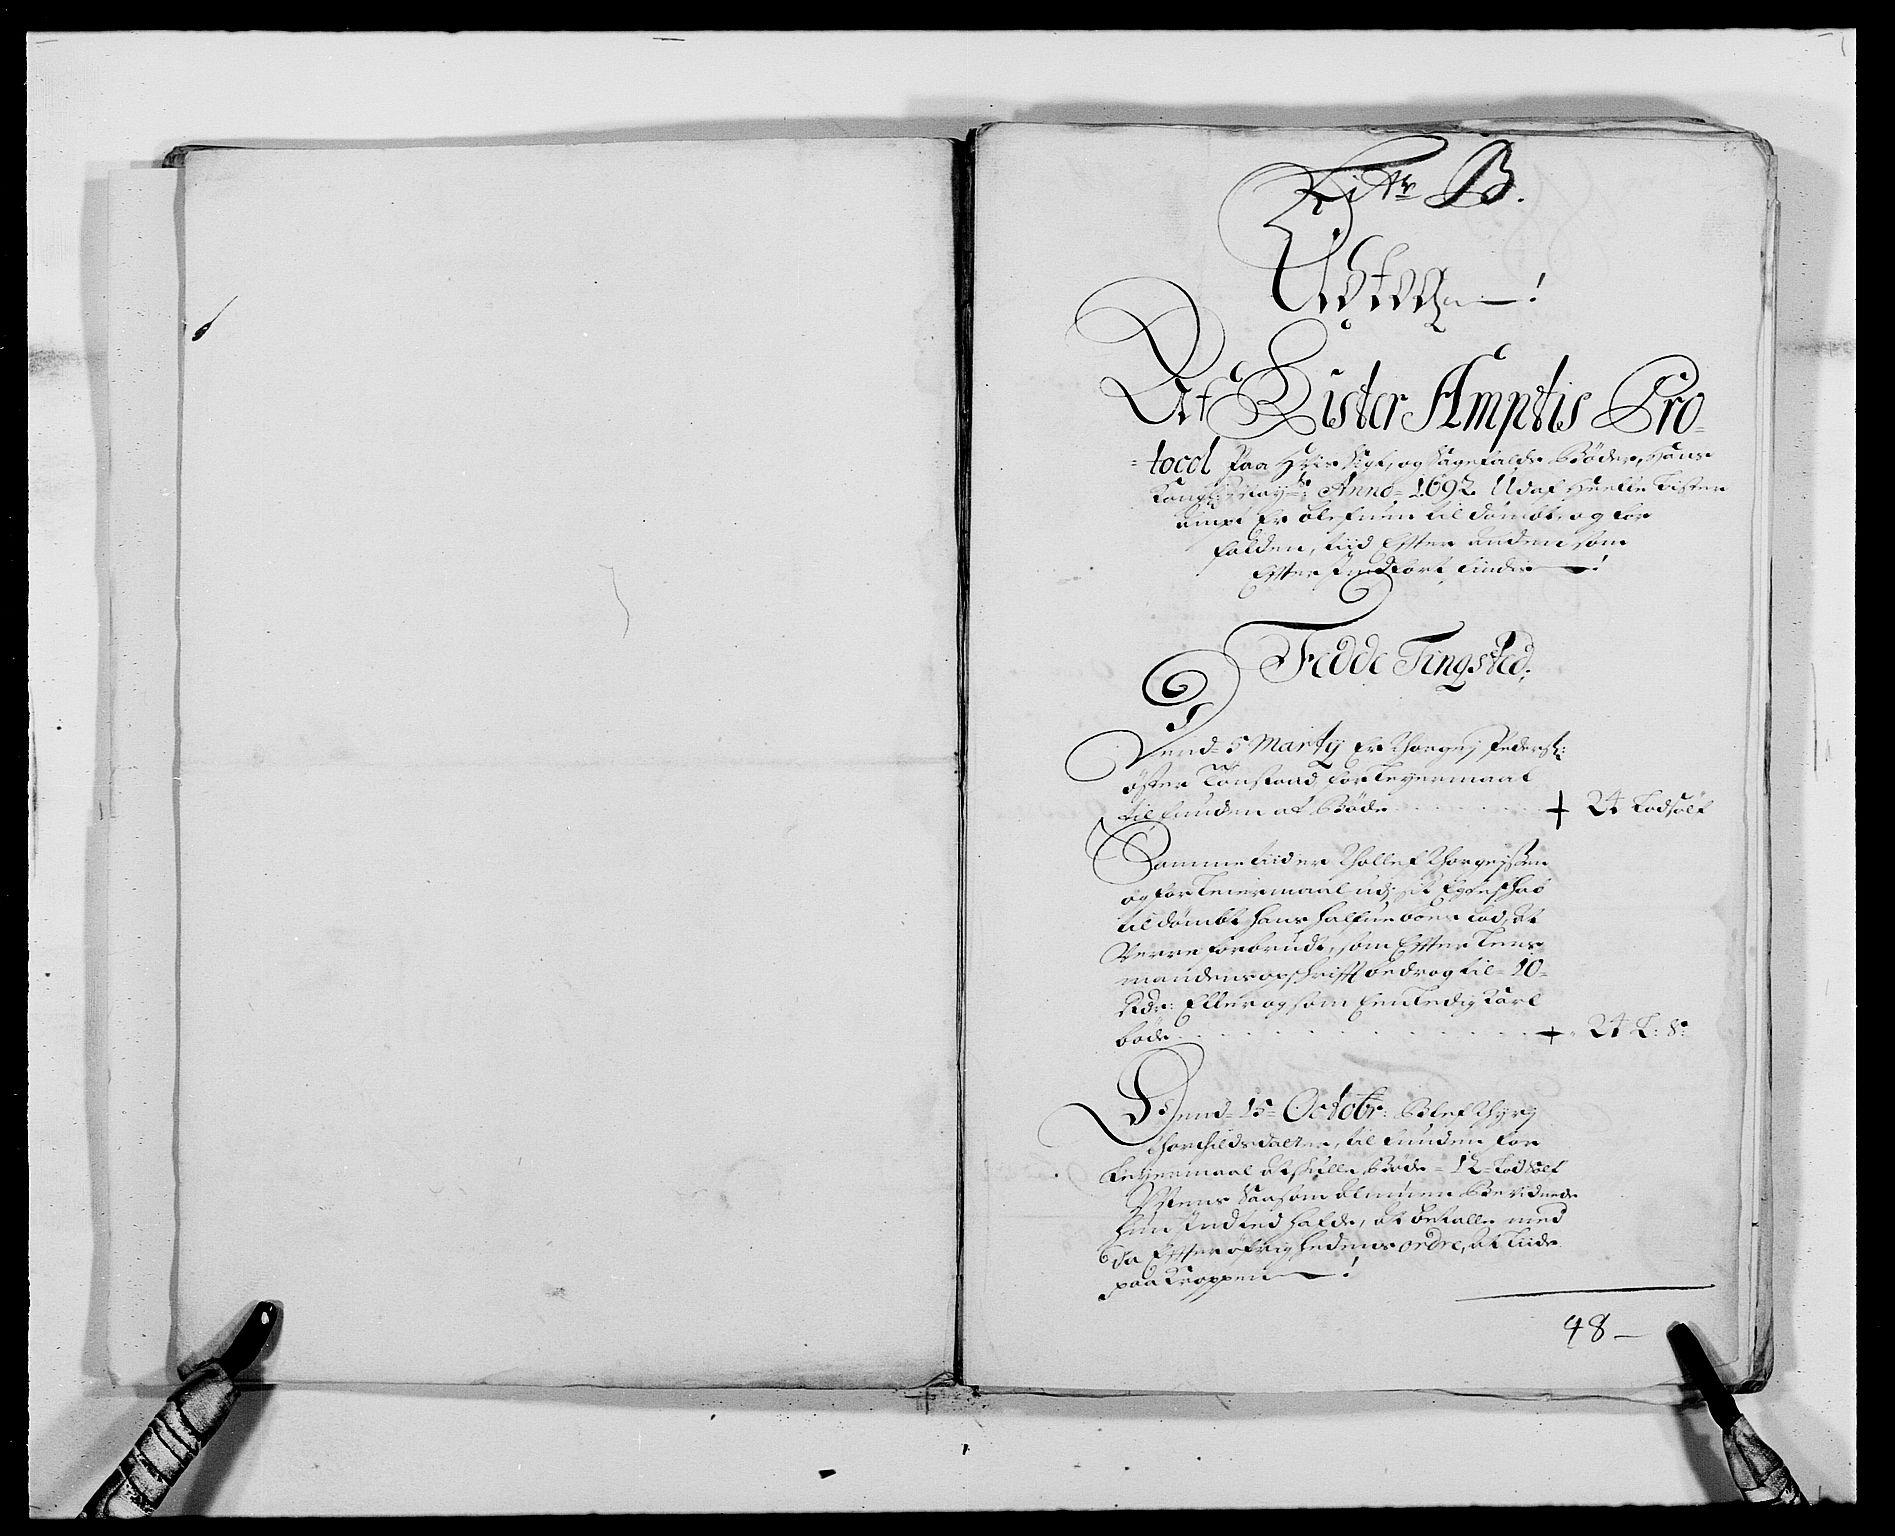 RA, Rentekammeret inntil 1814, Reviderte regnskaper, Fogderegnskap, R41/L2536: Fogderegnskap Lista, 1690-1693, s. 206